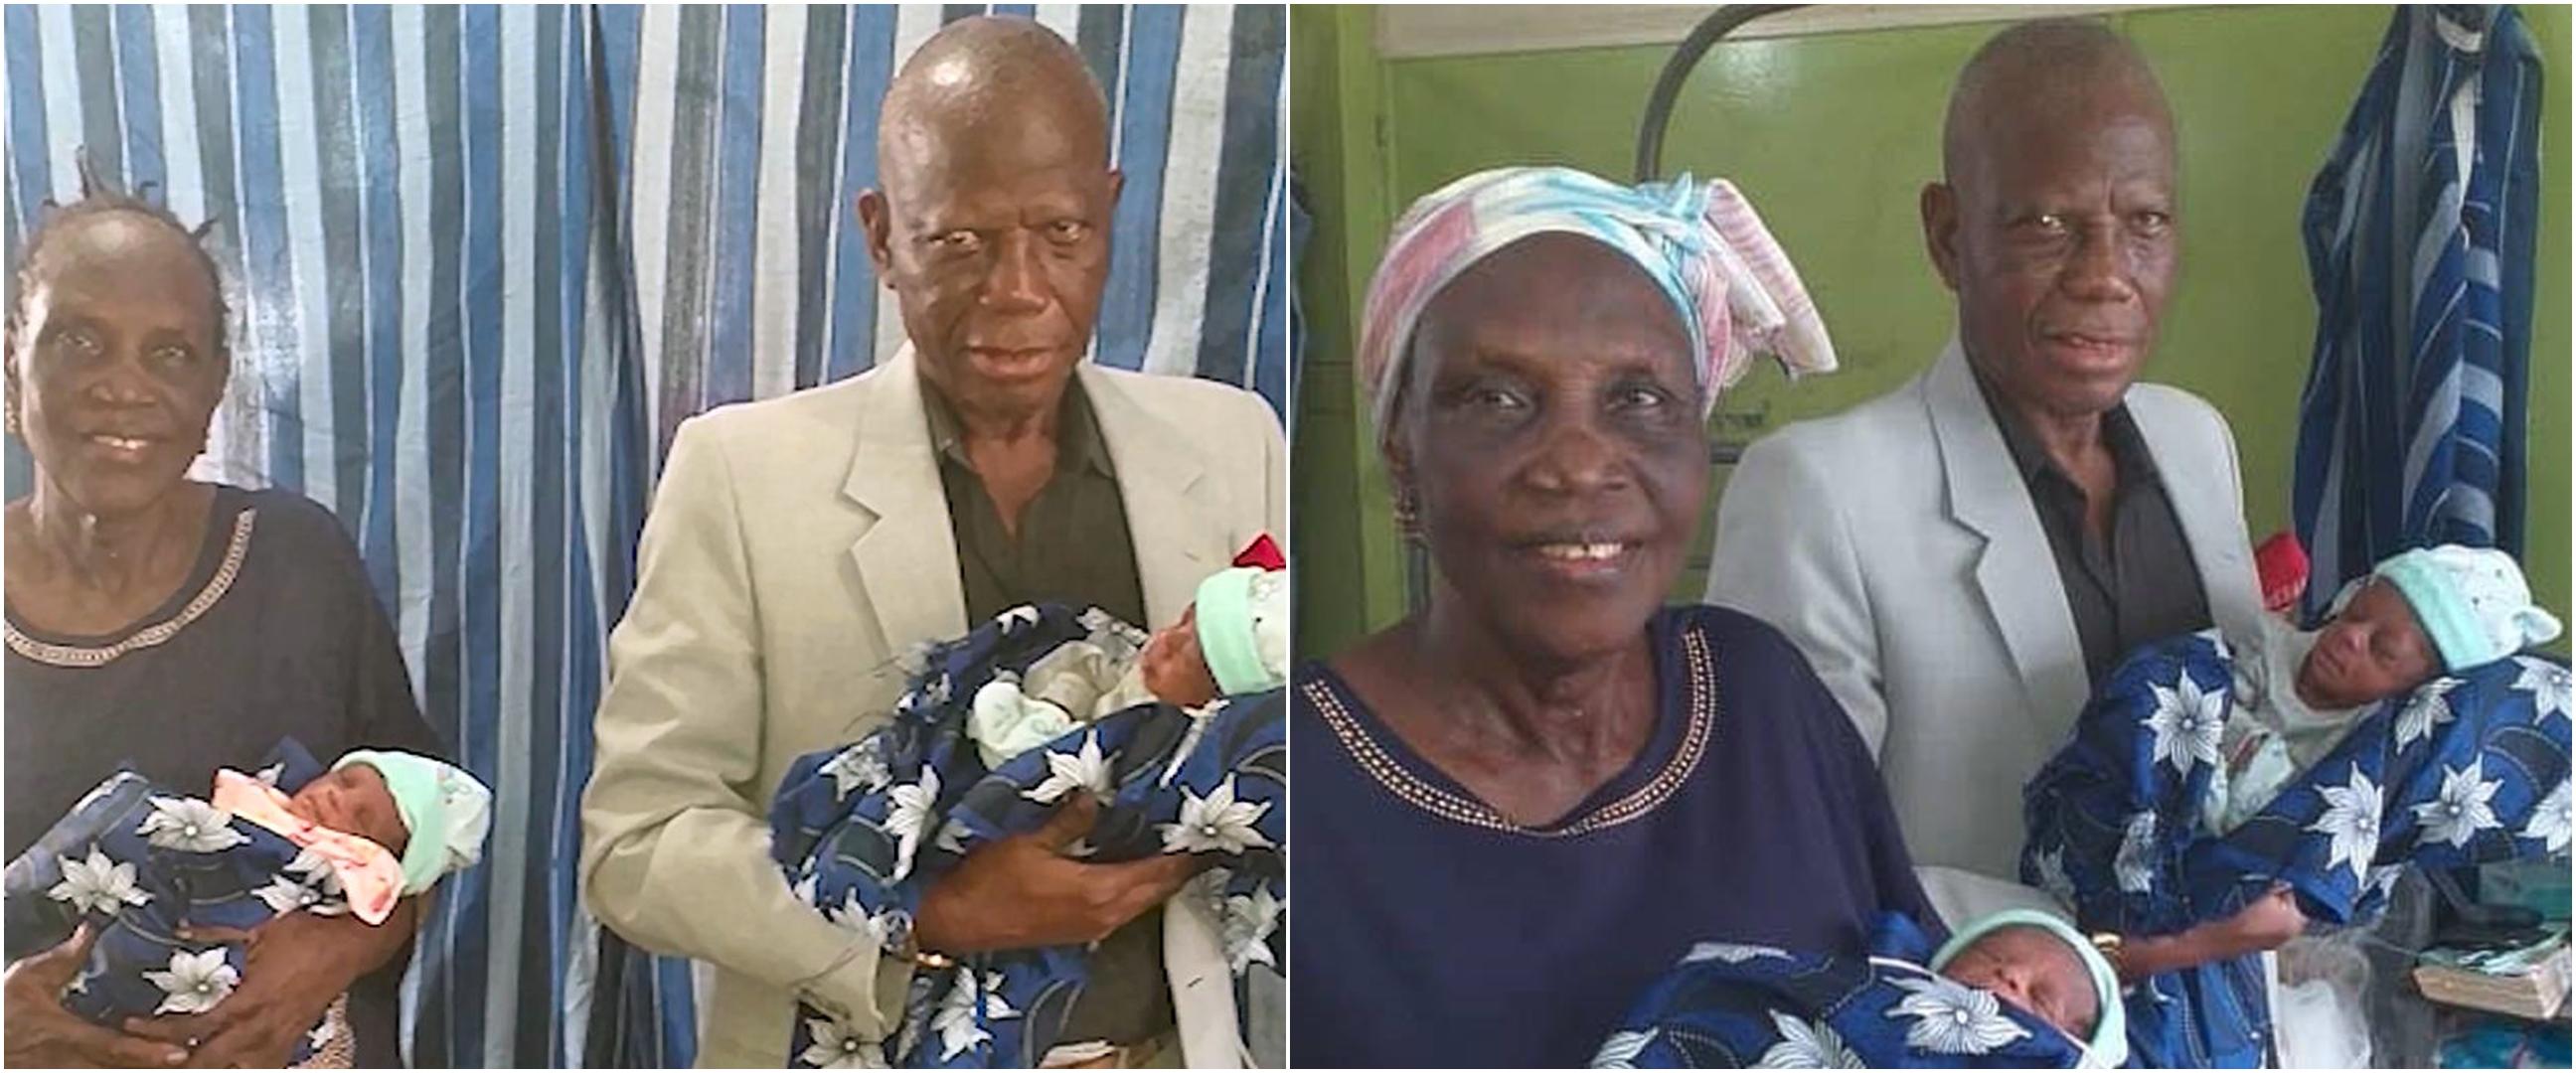 50 Tahun menanti, wanita 68 tahun akhirnya lahirkan bayi kembar